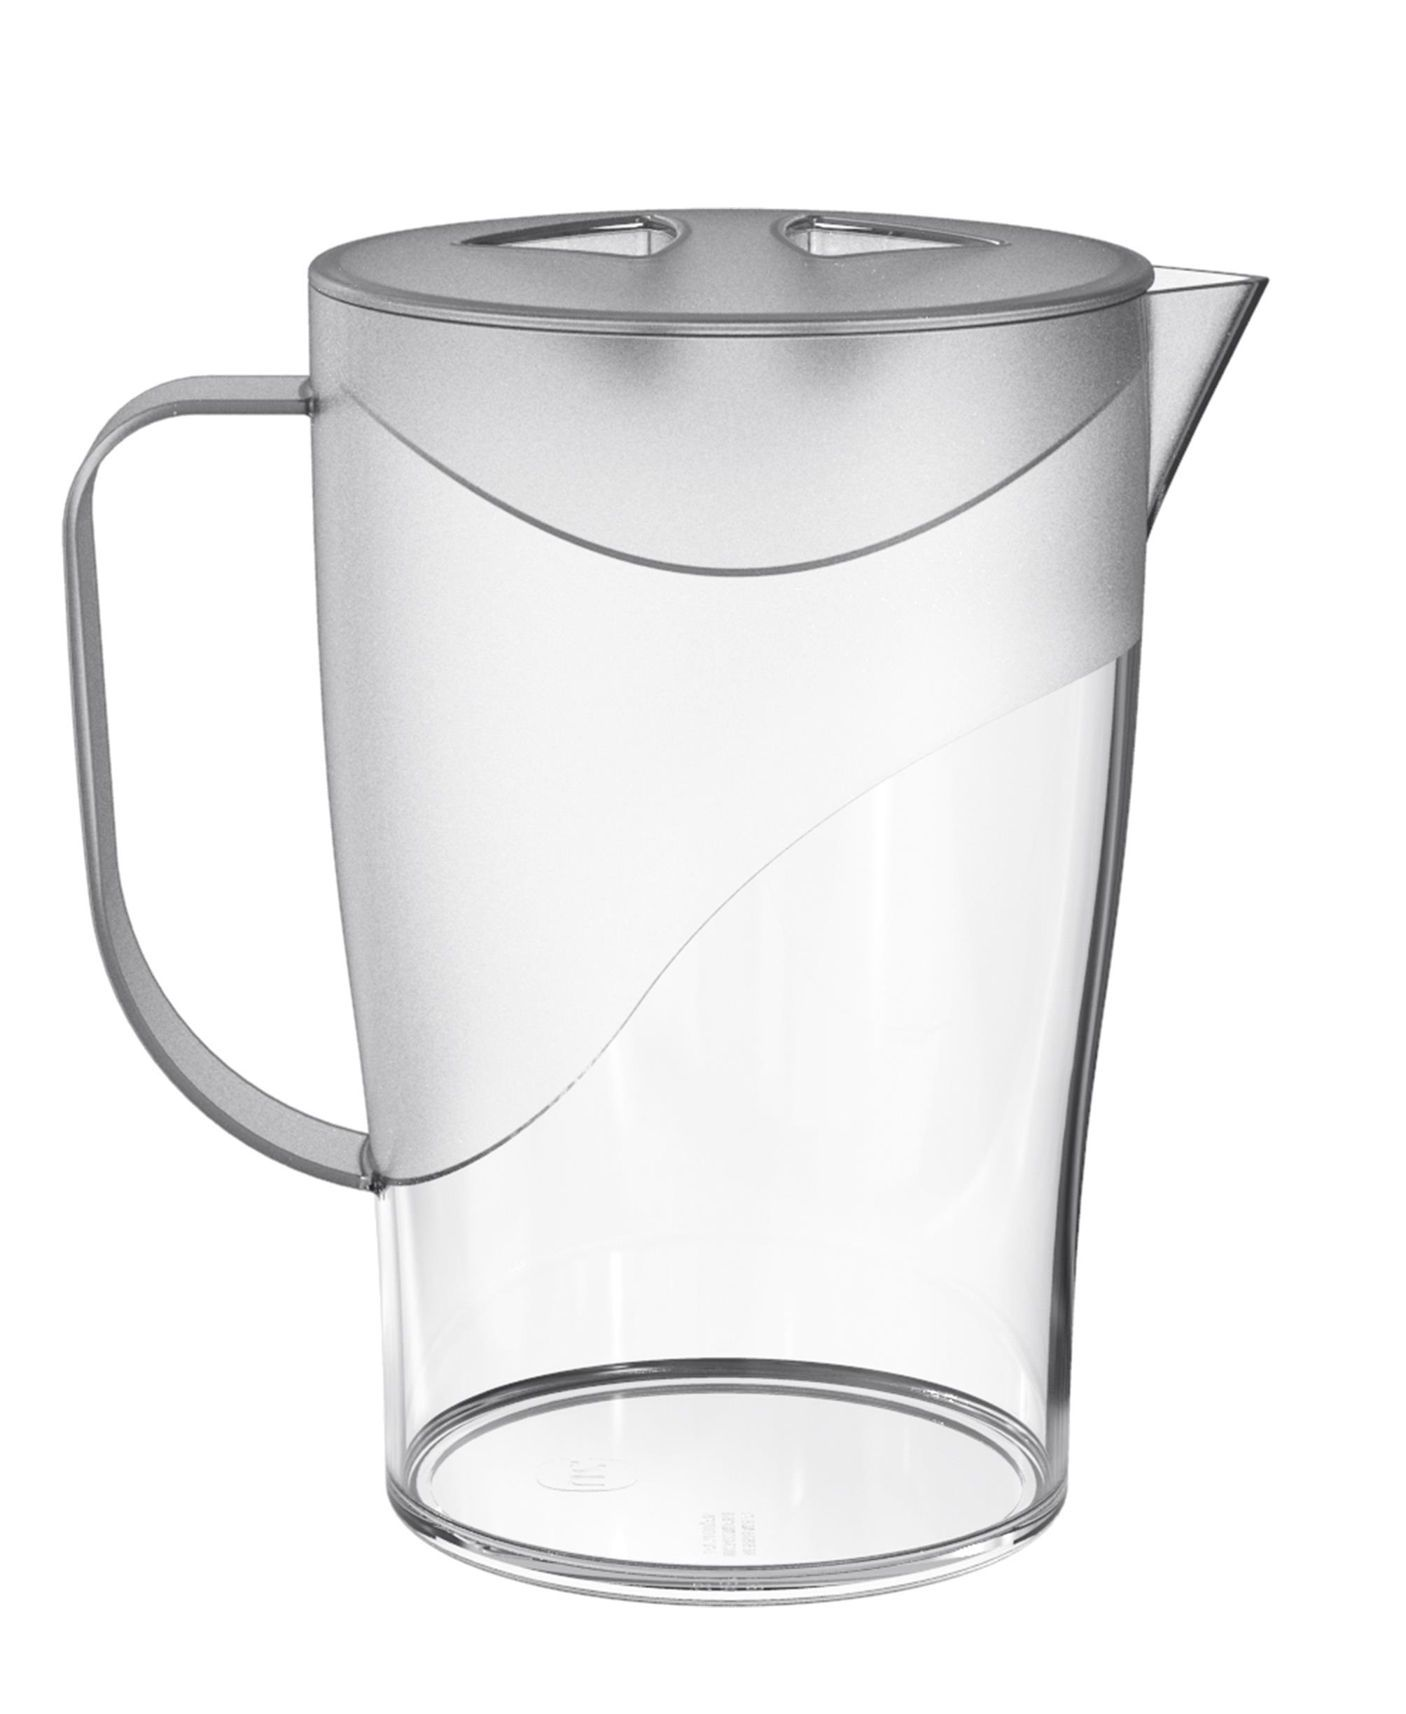 Jarra de Plástico 2L Transparente Translúcido